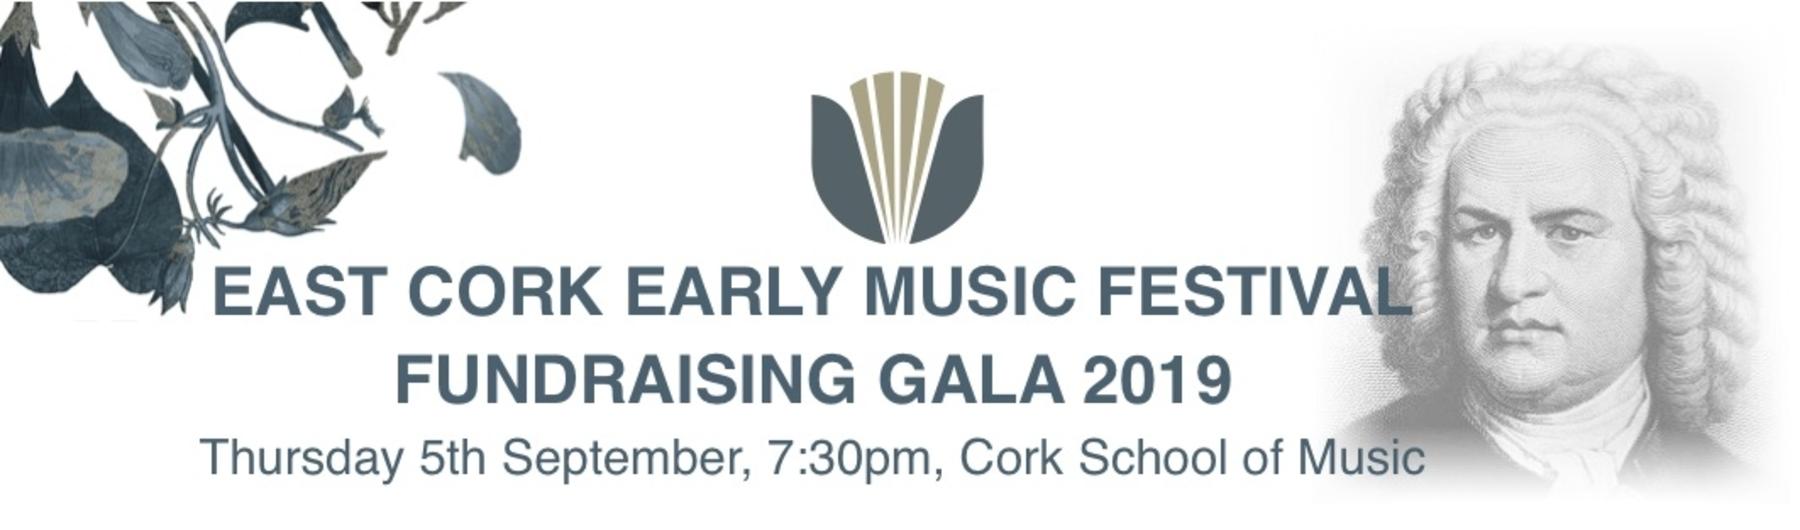 East Cork Early Music Festival Fundraising Gala 2019